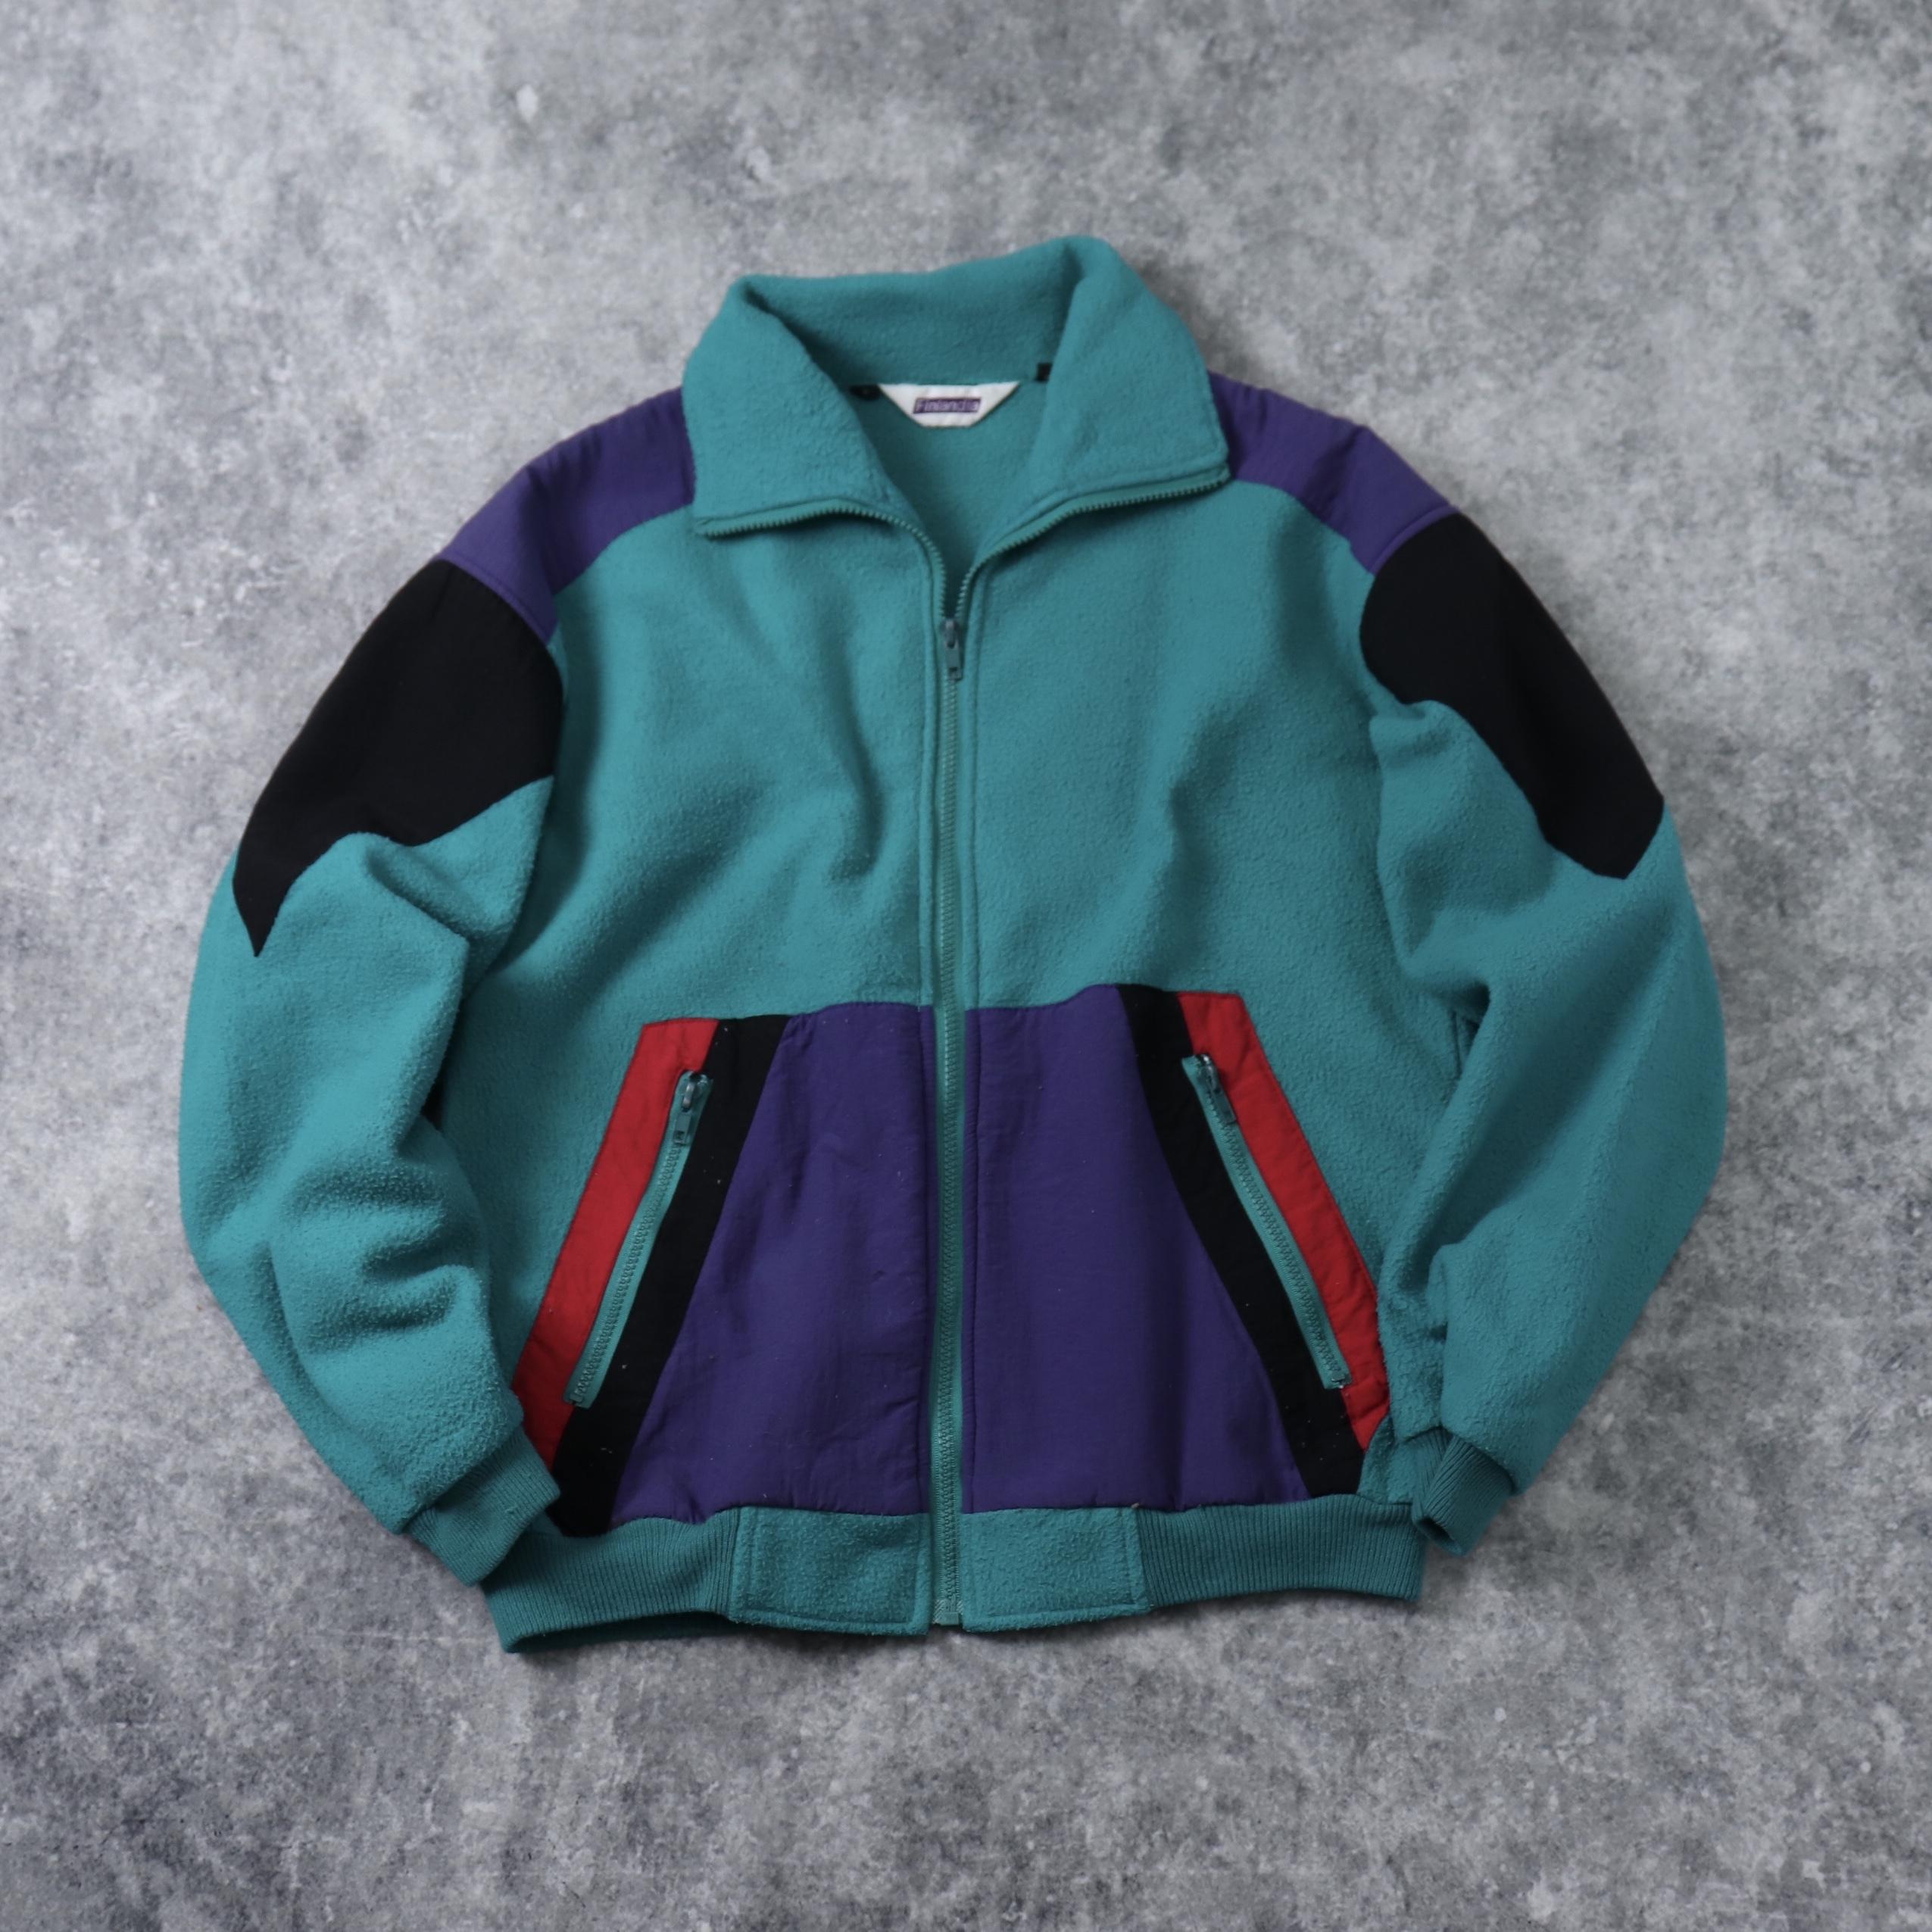 90's ''Finlandia'' Fleece Jacket 90年代 フィンランディア フリース フリースジャケット A627